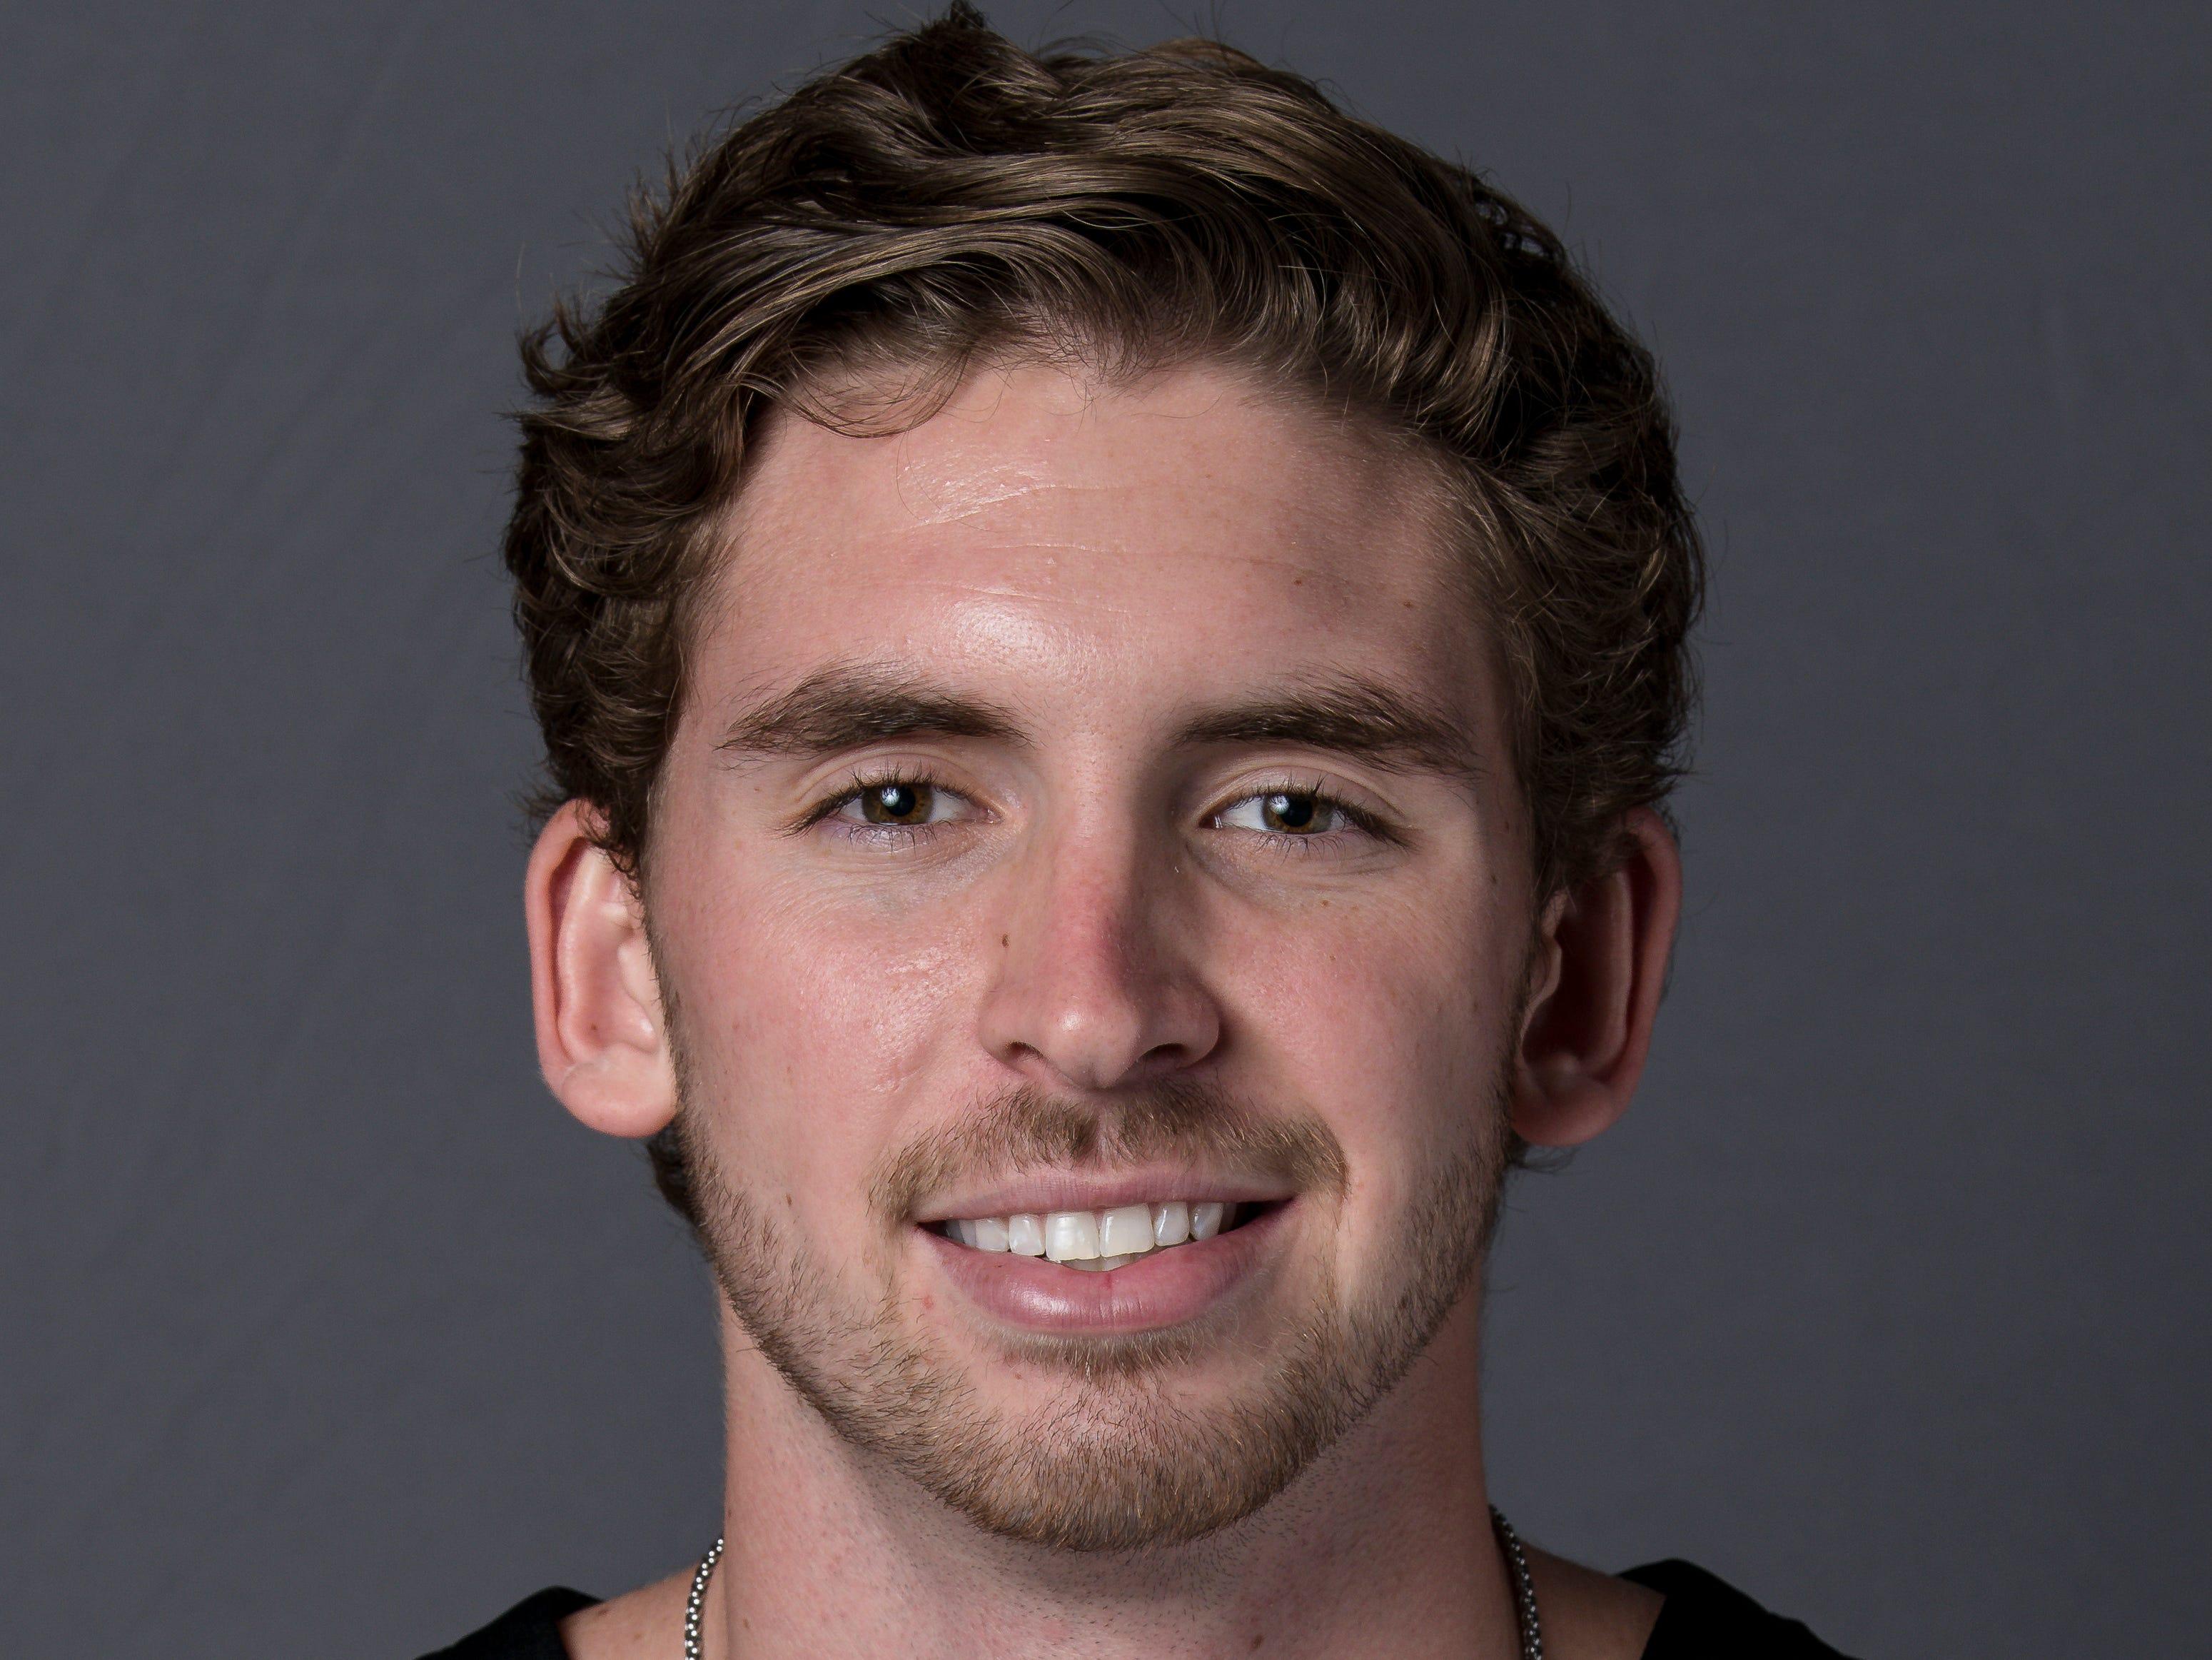 Ryan Cline